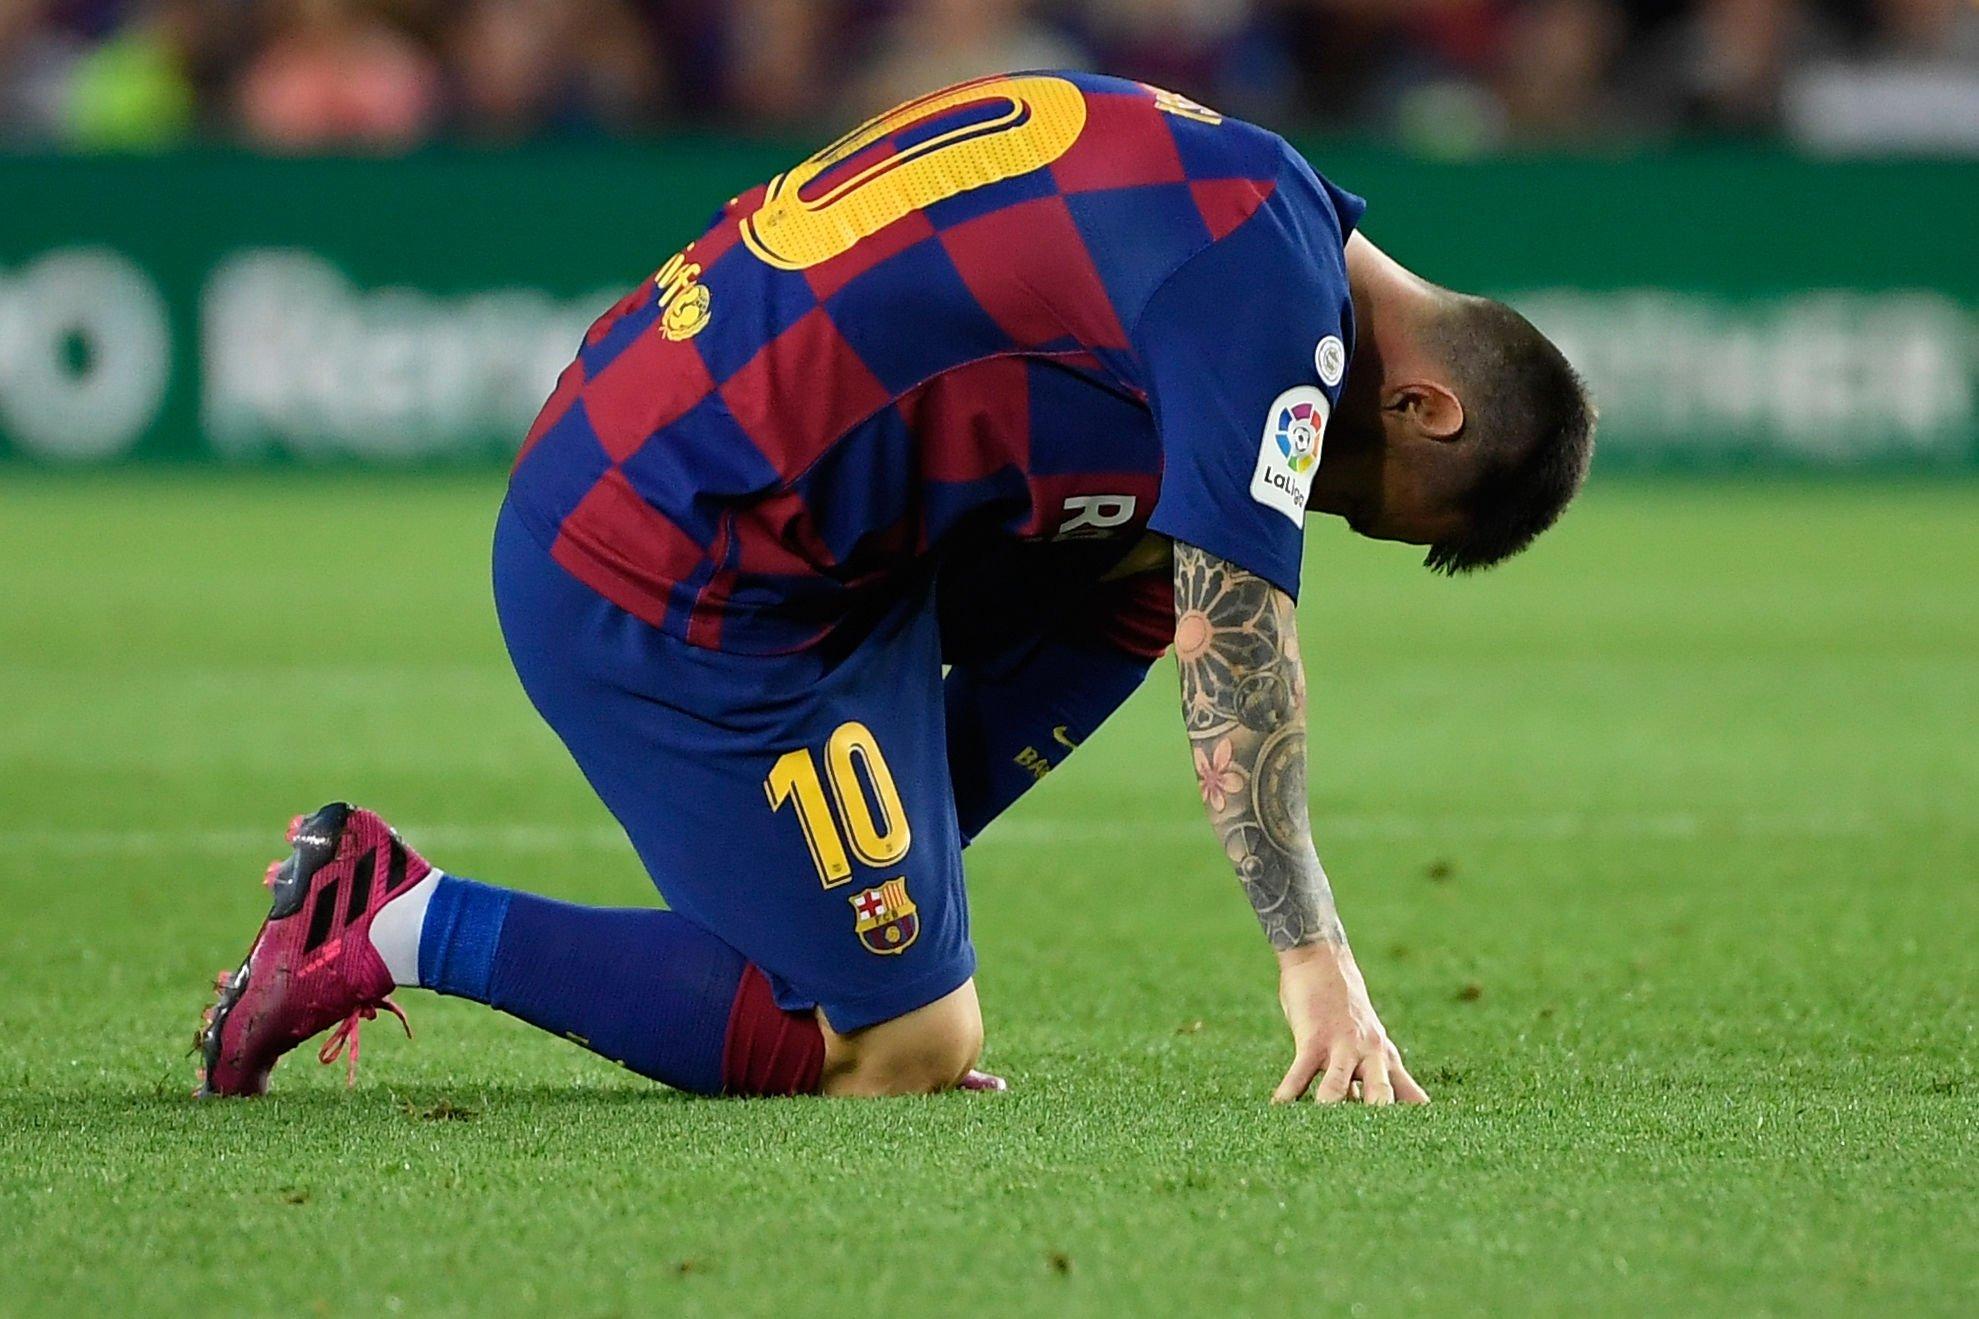 barcelona-بارسلونا-مهاجم-آرژانتین-نیوکمپ-لالیگا-اسپانیا-مصدومیت مسی